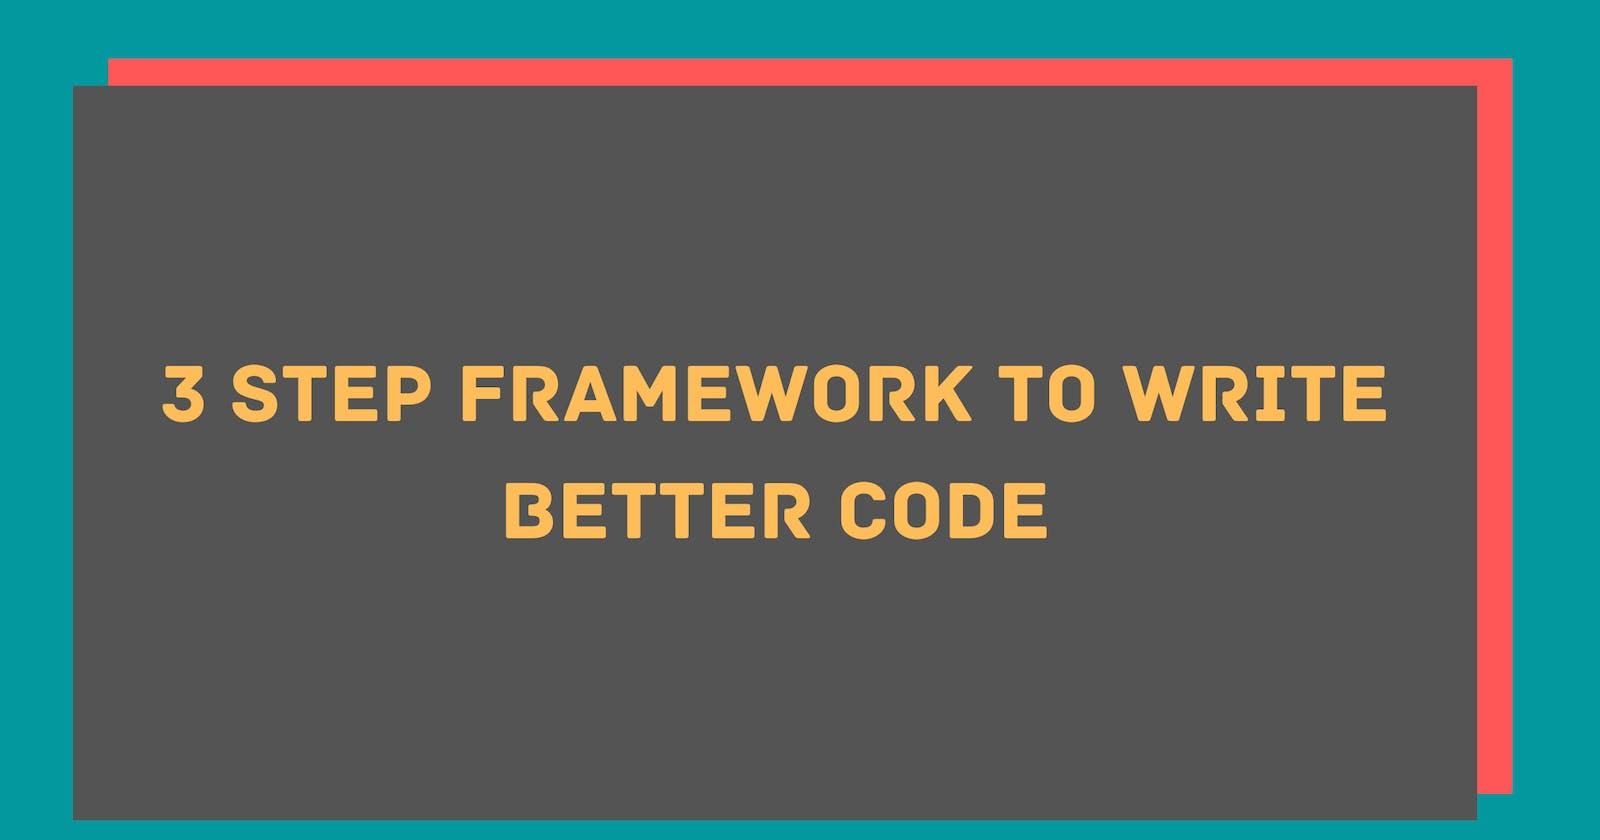 3 step framework to write better code